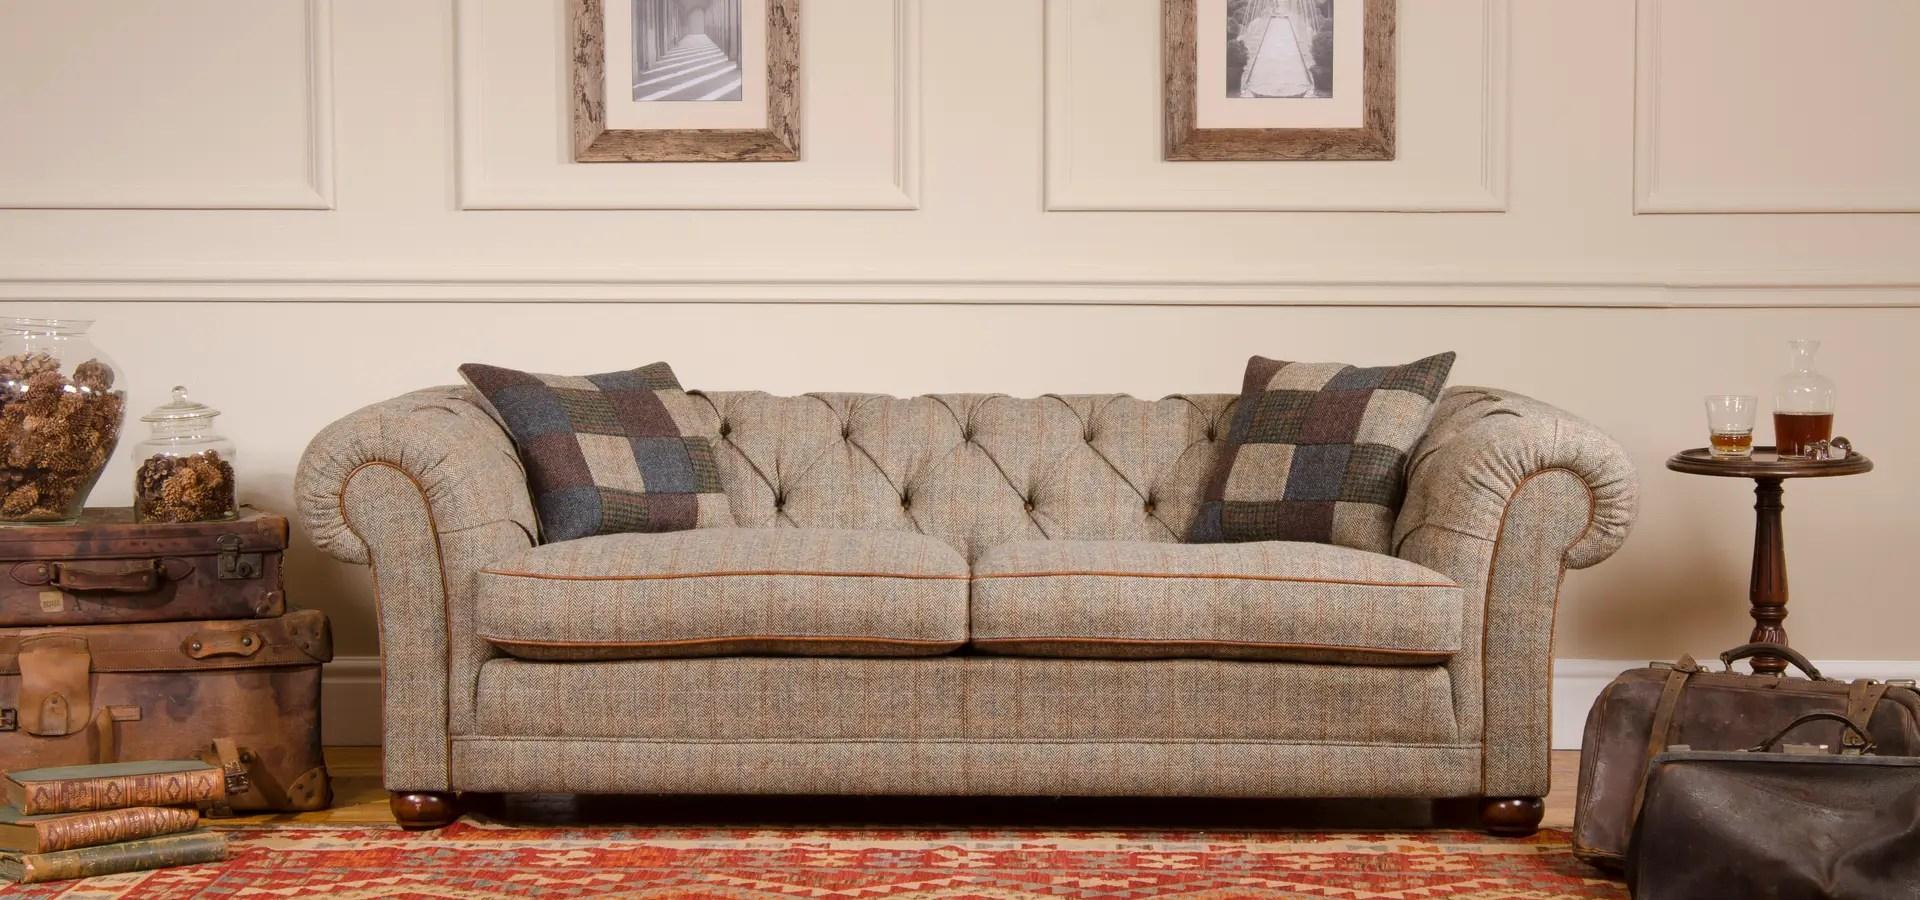 harris tweed bowmore midi sofa showrooms west london classic by tetrad ltd homify